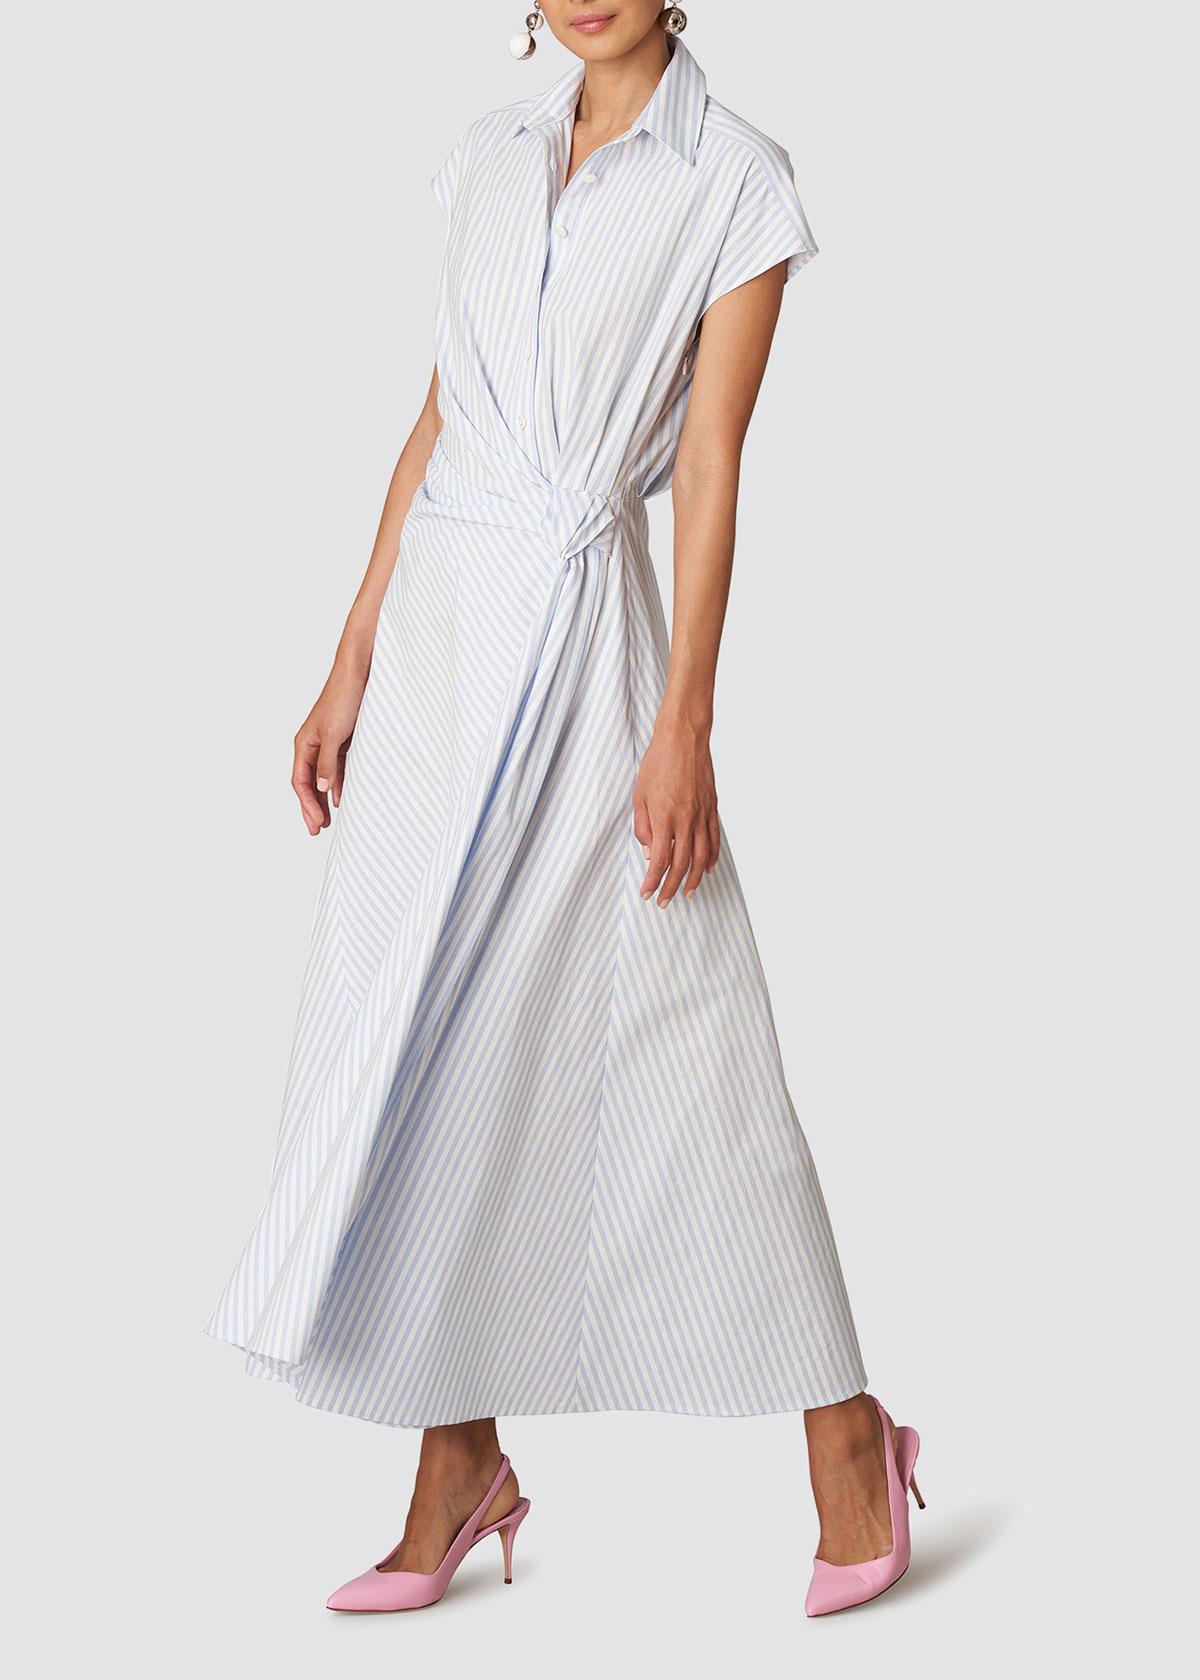 Carolina Herrera STRIPED SIDE-KNOT DRESS